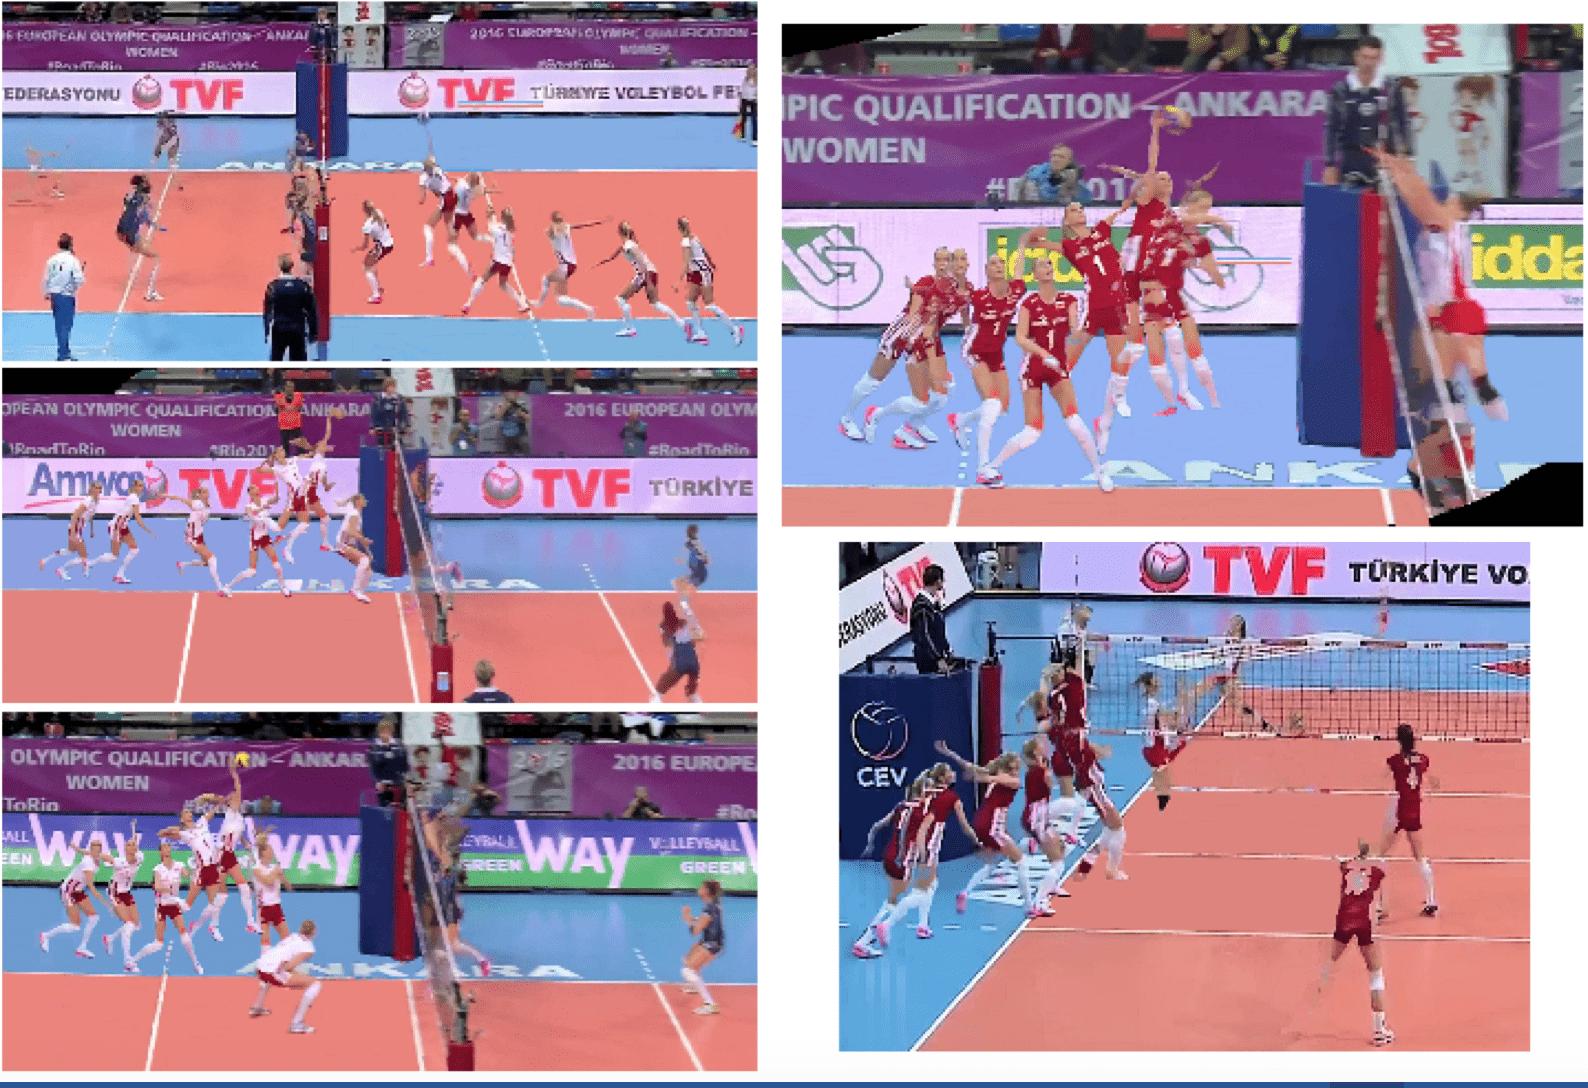 Anna Baranska Werblinska of Poland - 2-Step Attack Footwork Analysis